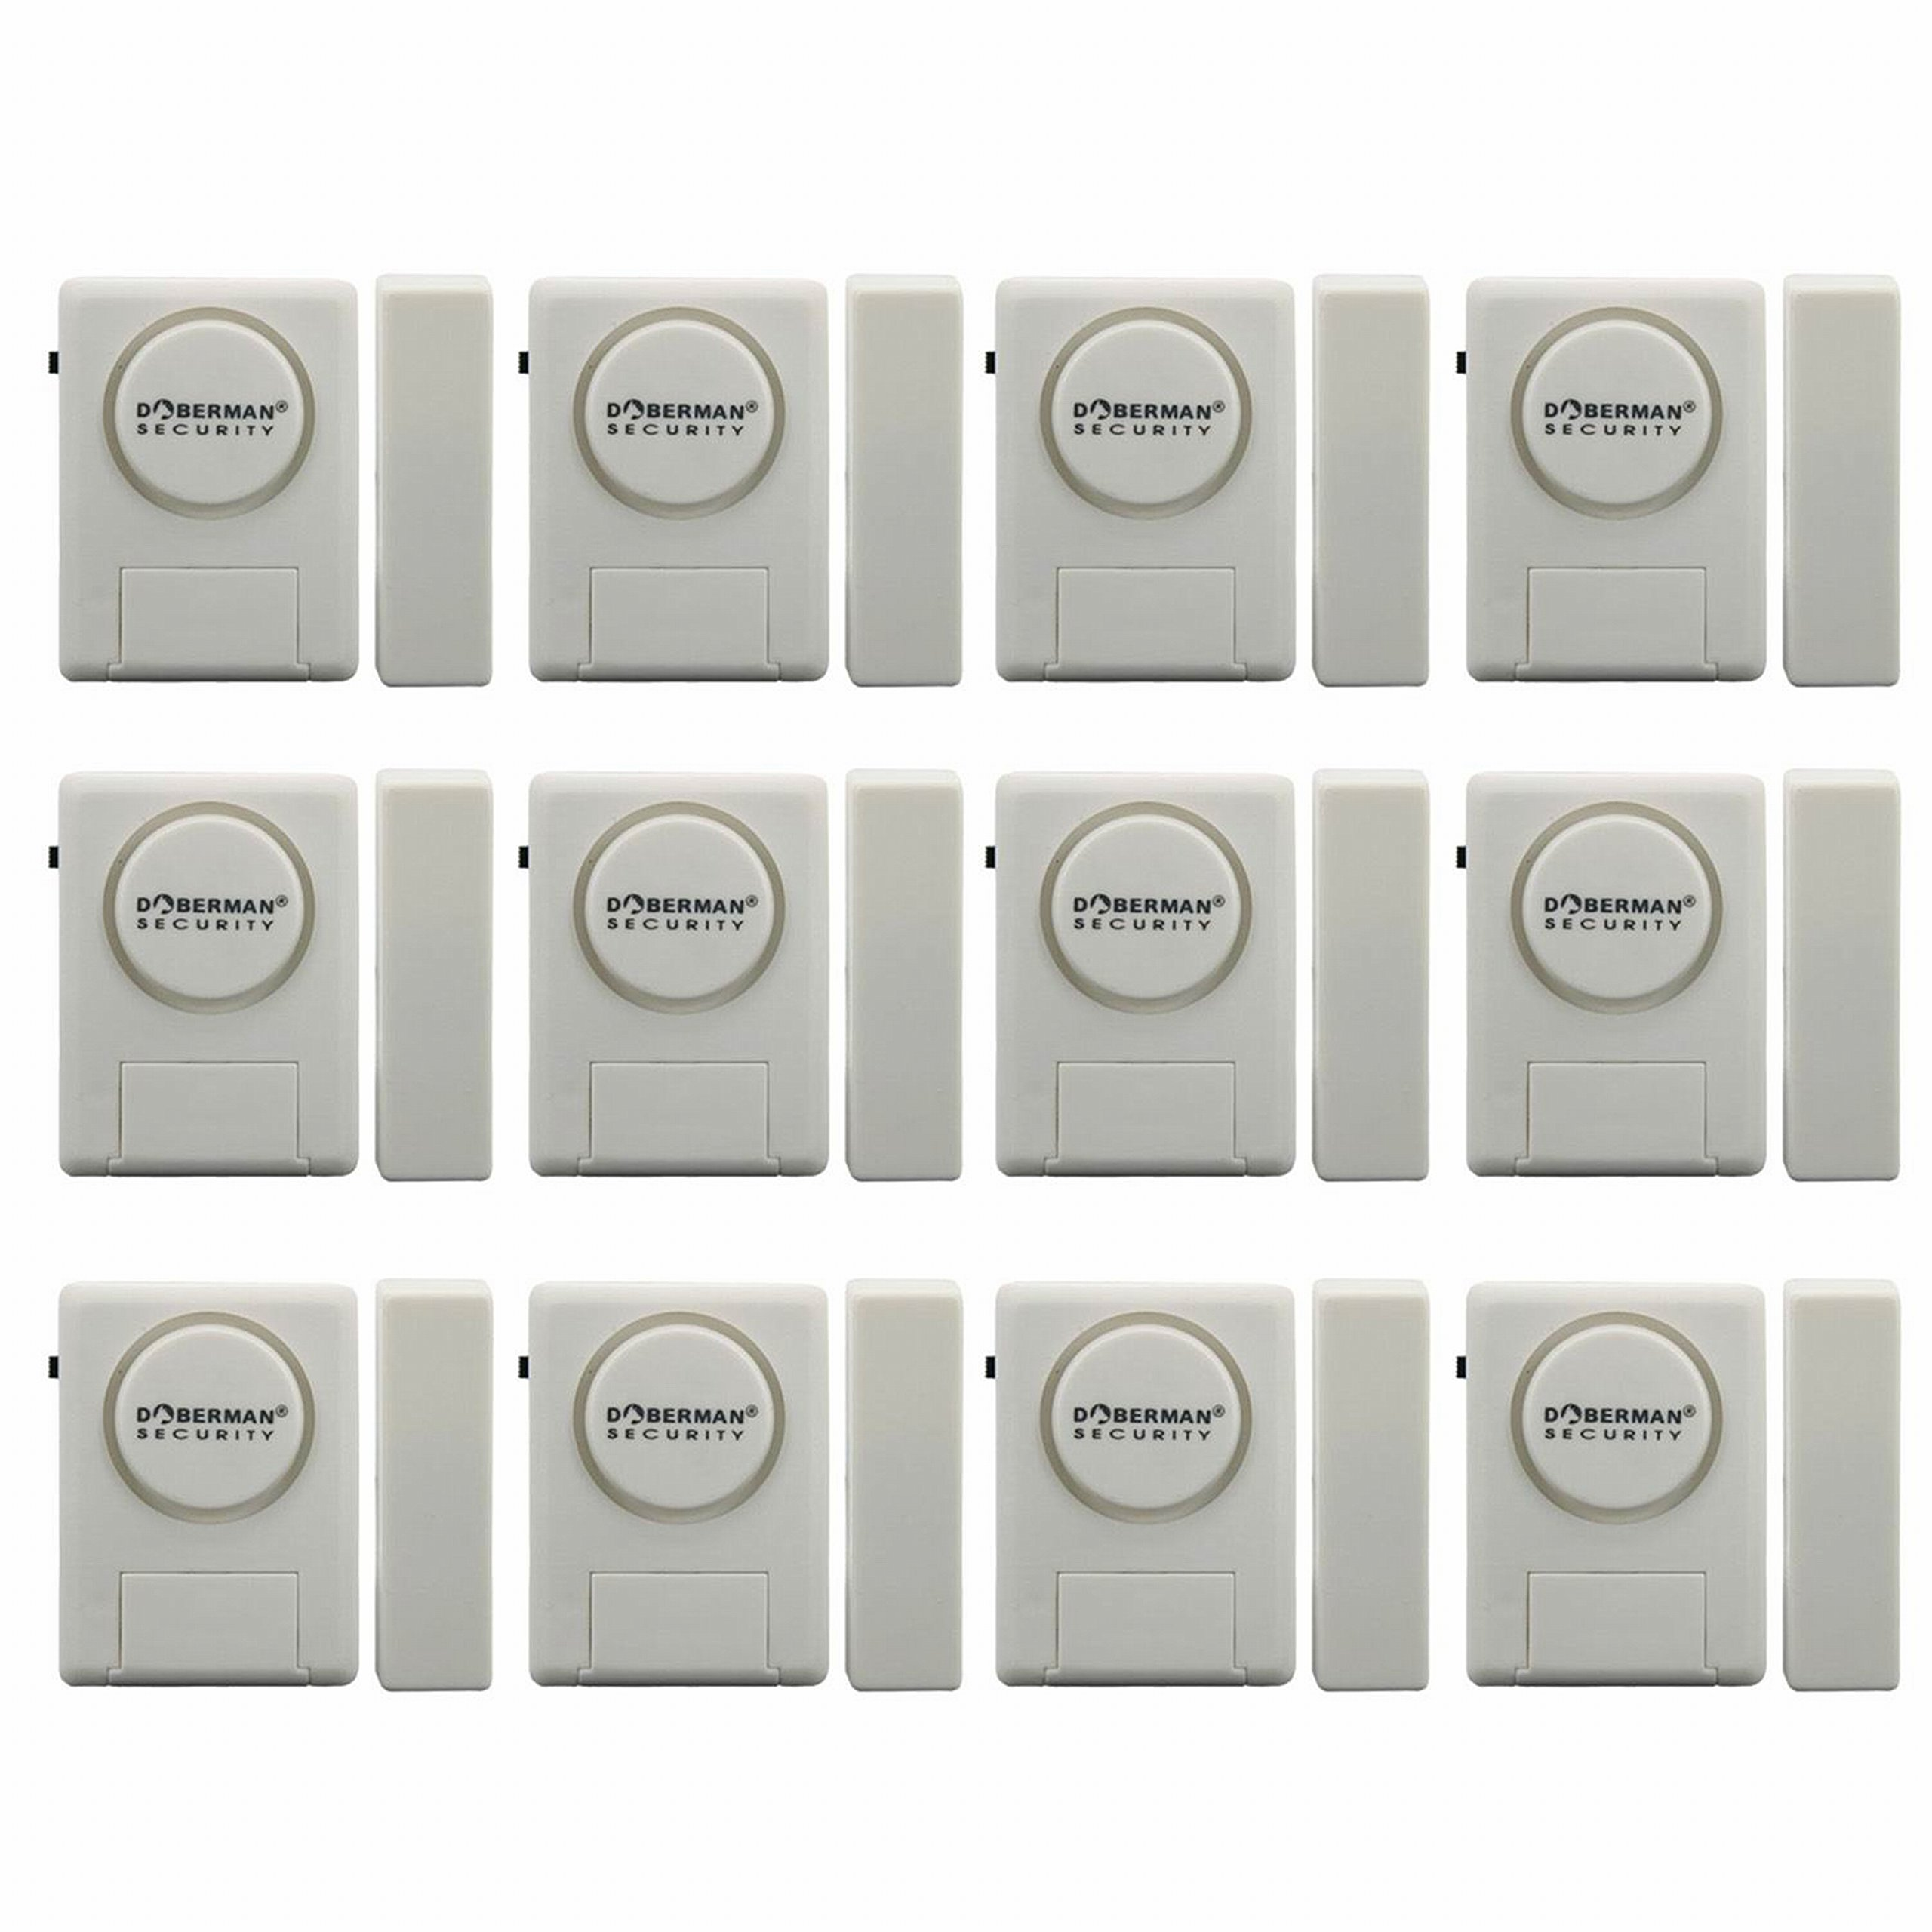 Doberman Security SE-0137 Home Security Window/Door Alarm Kit, 12 Pack (White)